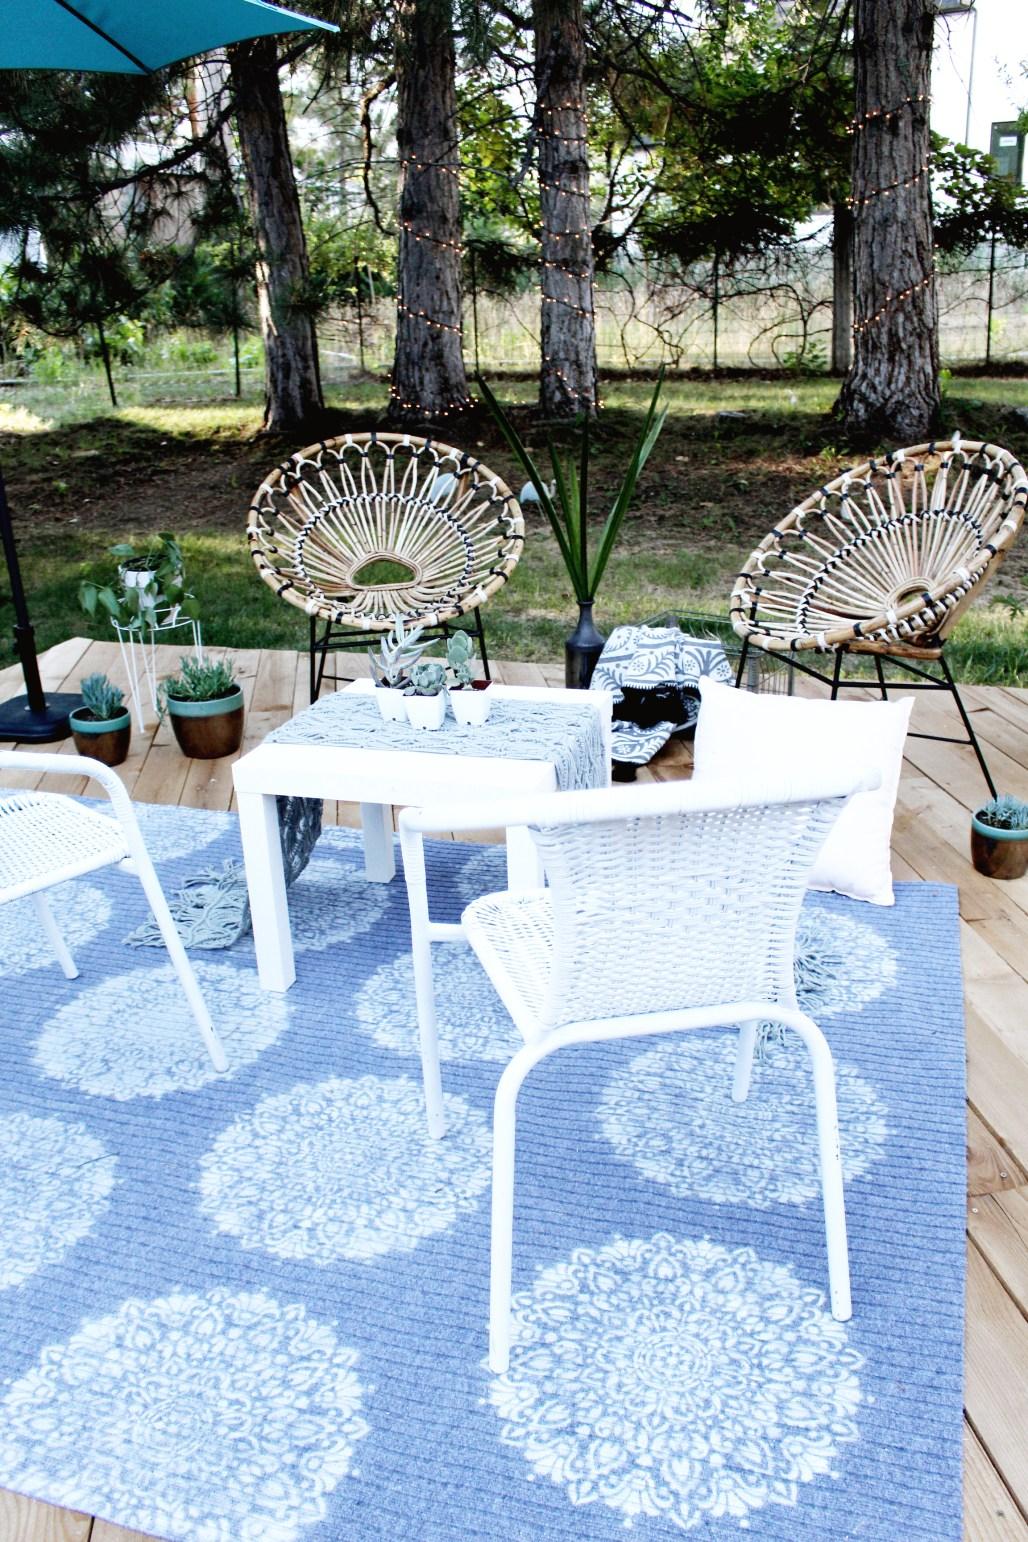 DIY Outdoor Rug with Spray Paint & Stencil